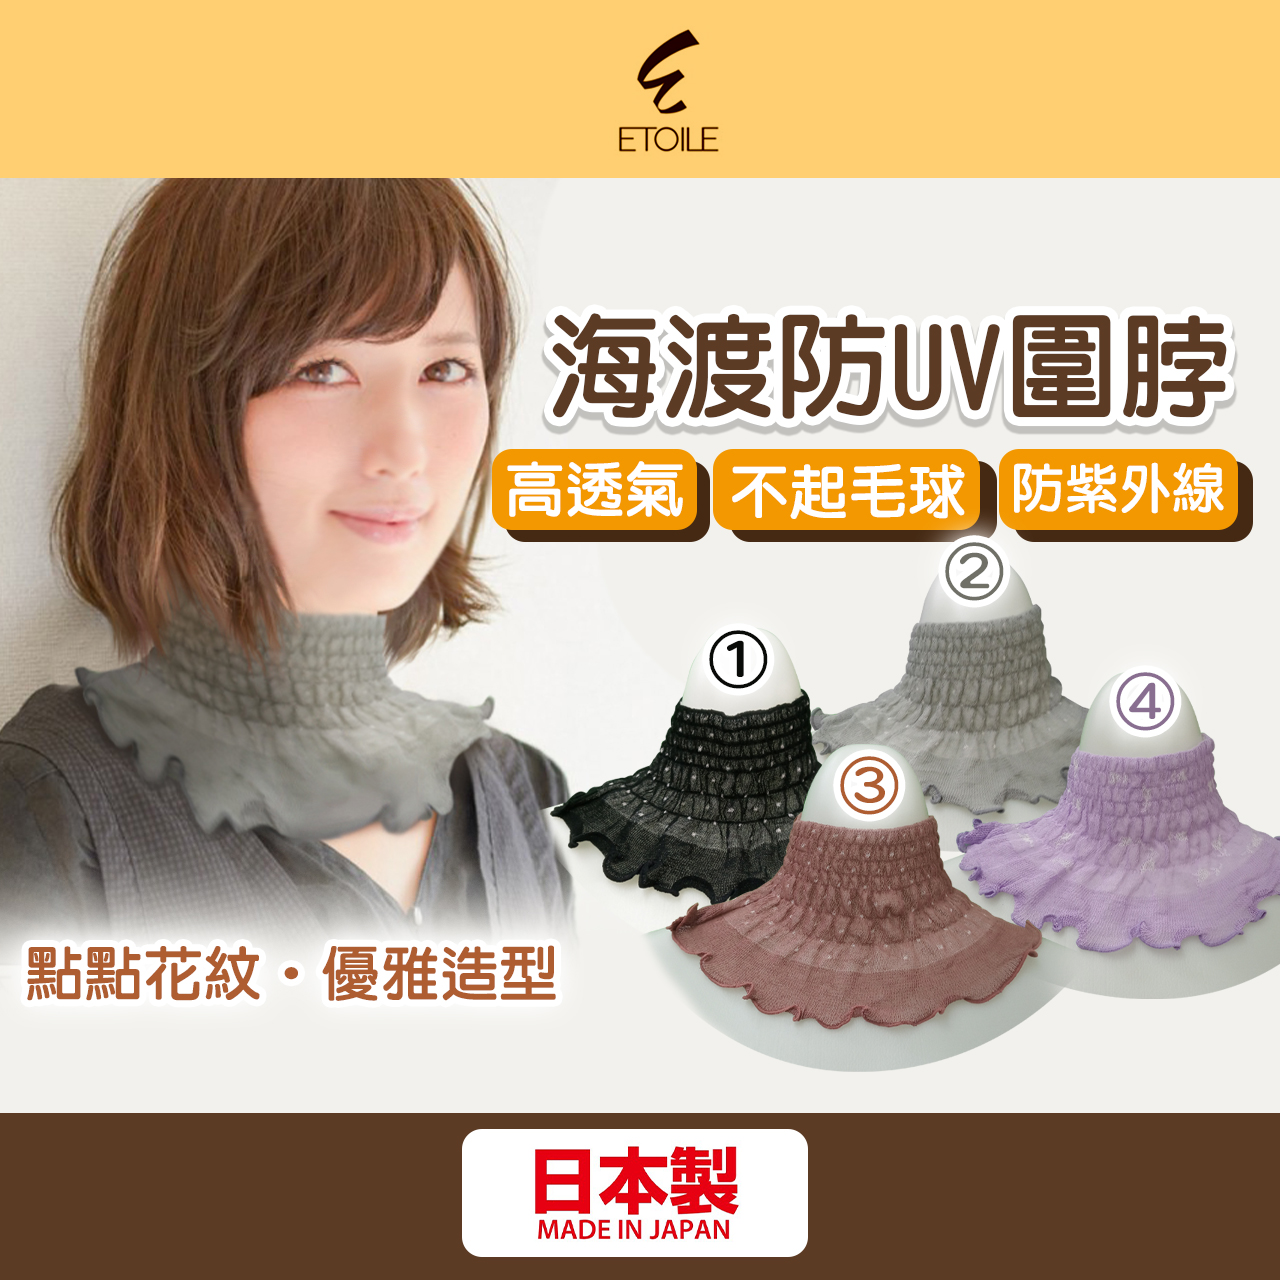 《HOYA-Life日本生活館》日本製 ETOILE 日本 海渡 防UV 抗UV 圍脖 脖圍